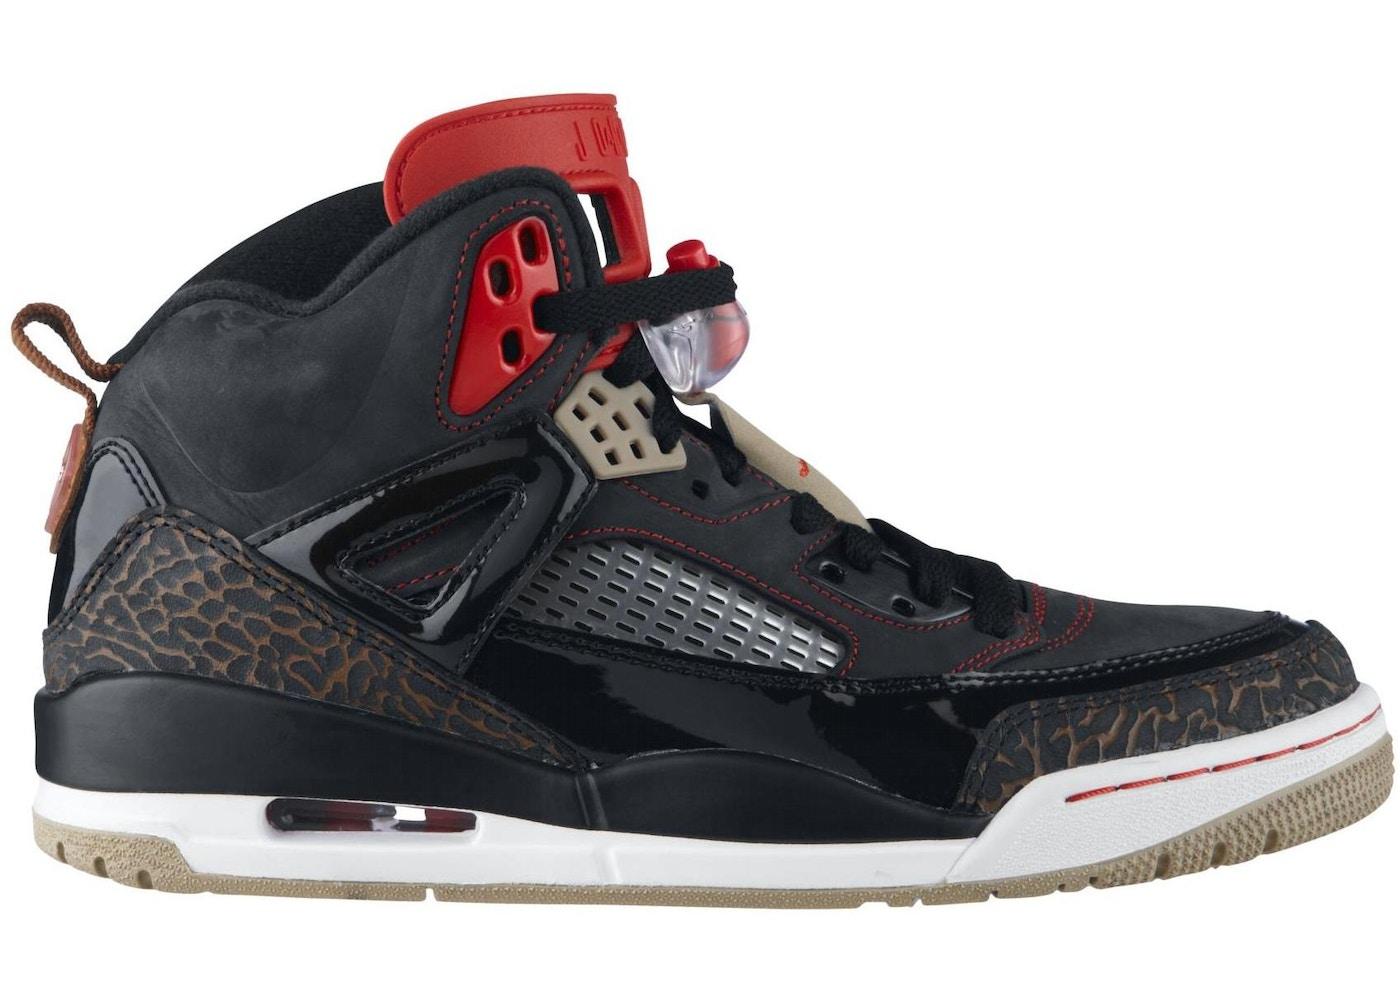 fc7e470cda7485 Air Jordan Spizike Size 14 Shoes - New Highest Bids